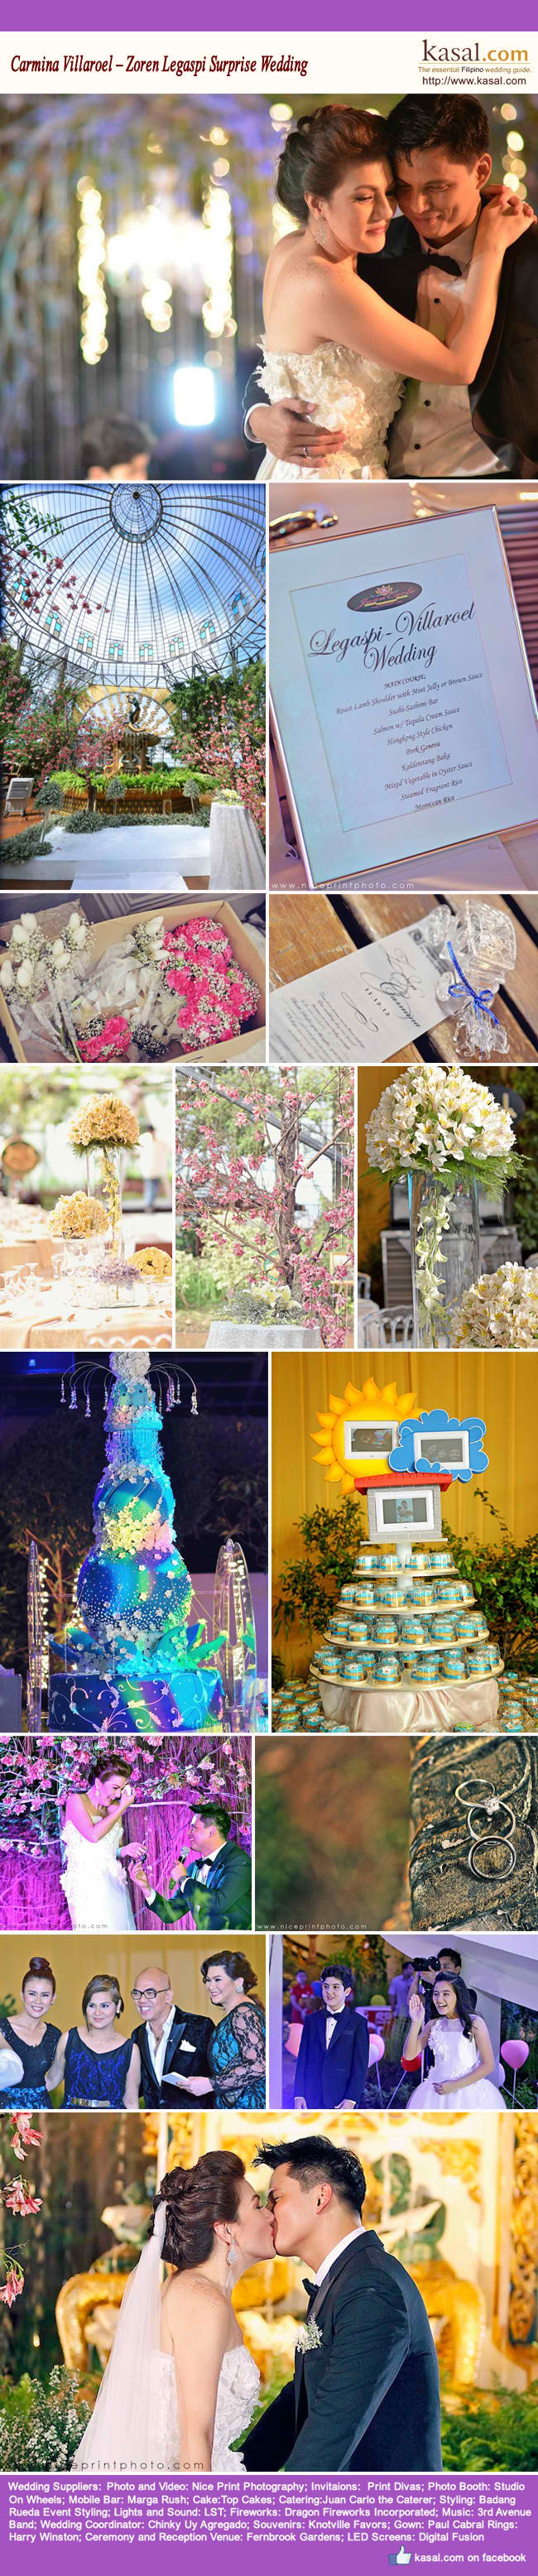 Featured Wedding: Regine & Ogie | Bridal Book FN